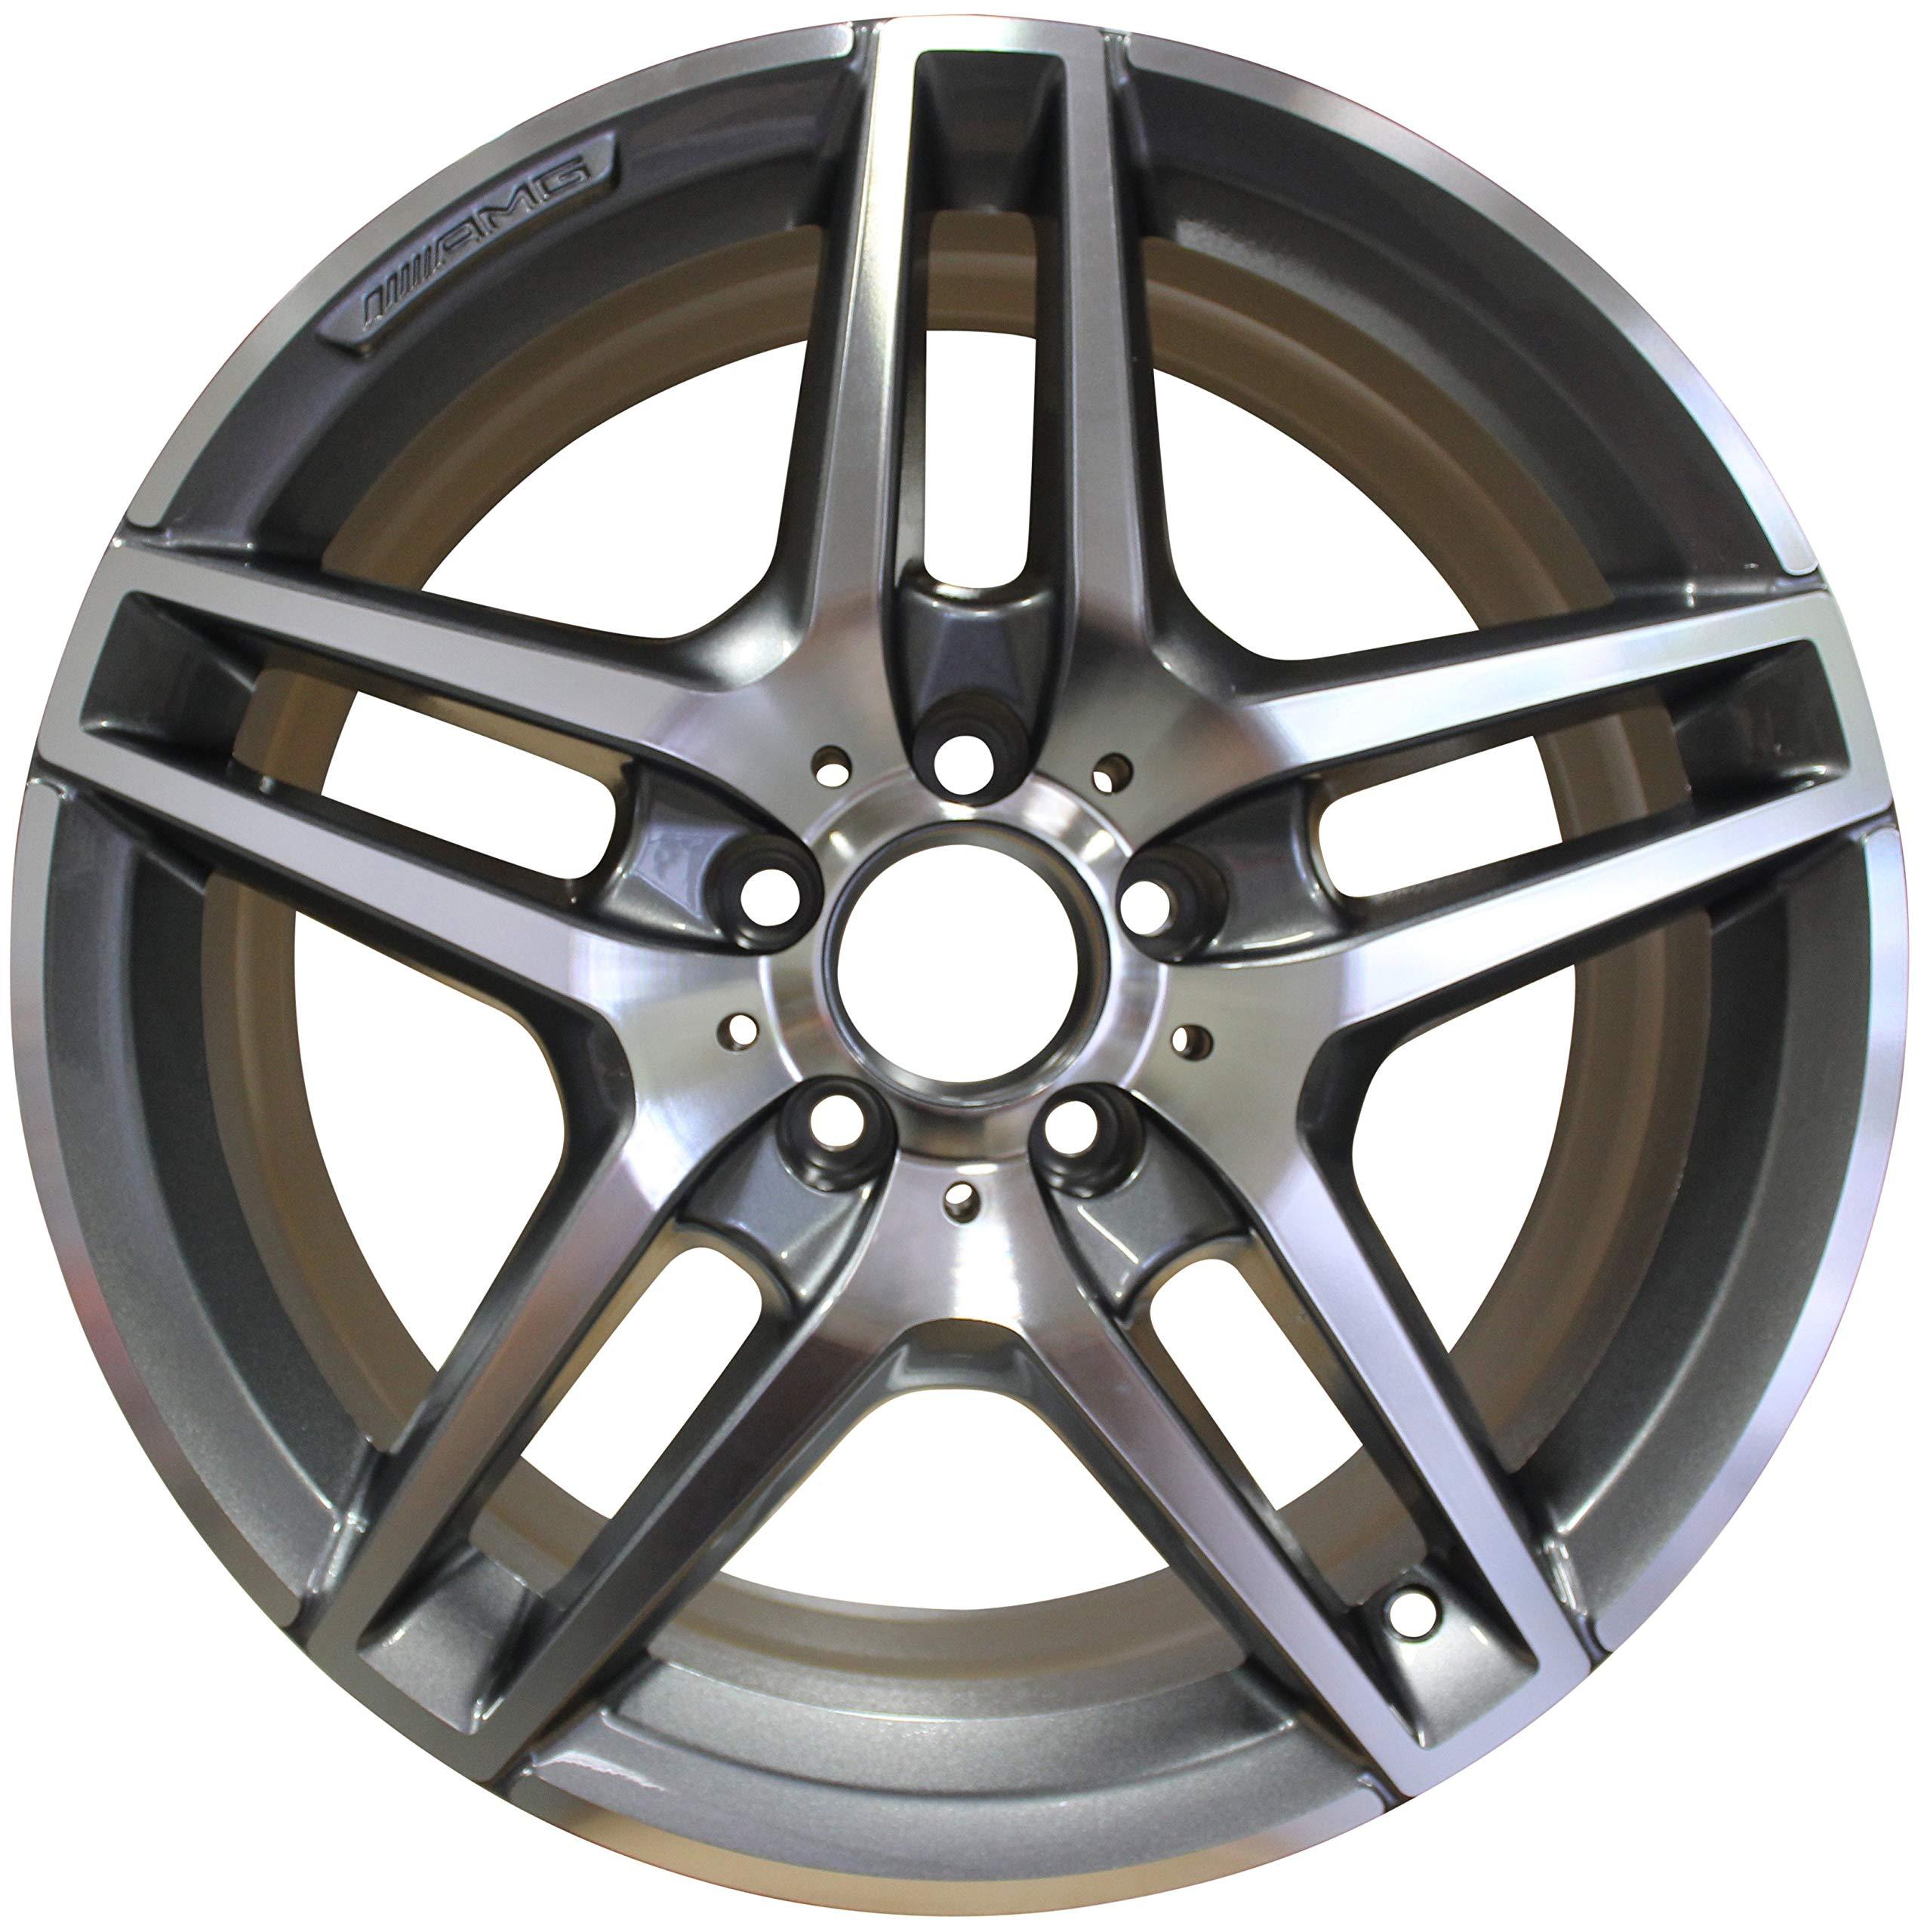 Dorman 939-135 Steel Wheel 15x5.5//4x114.3mm